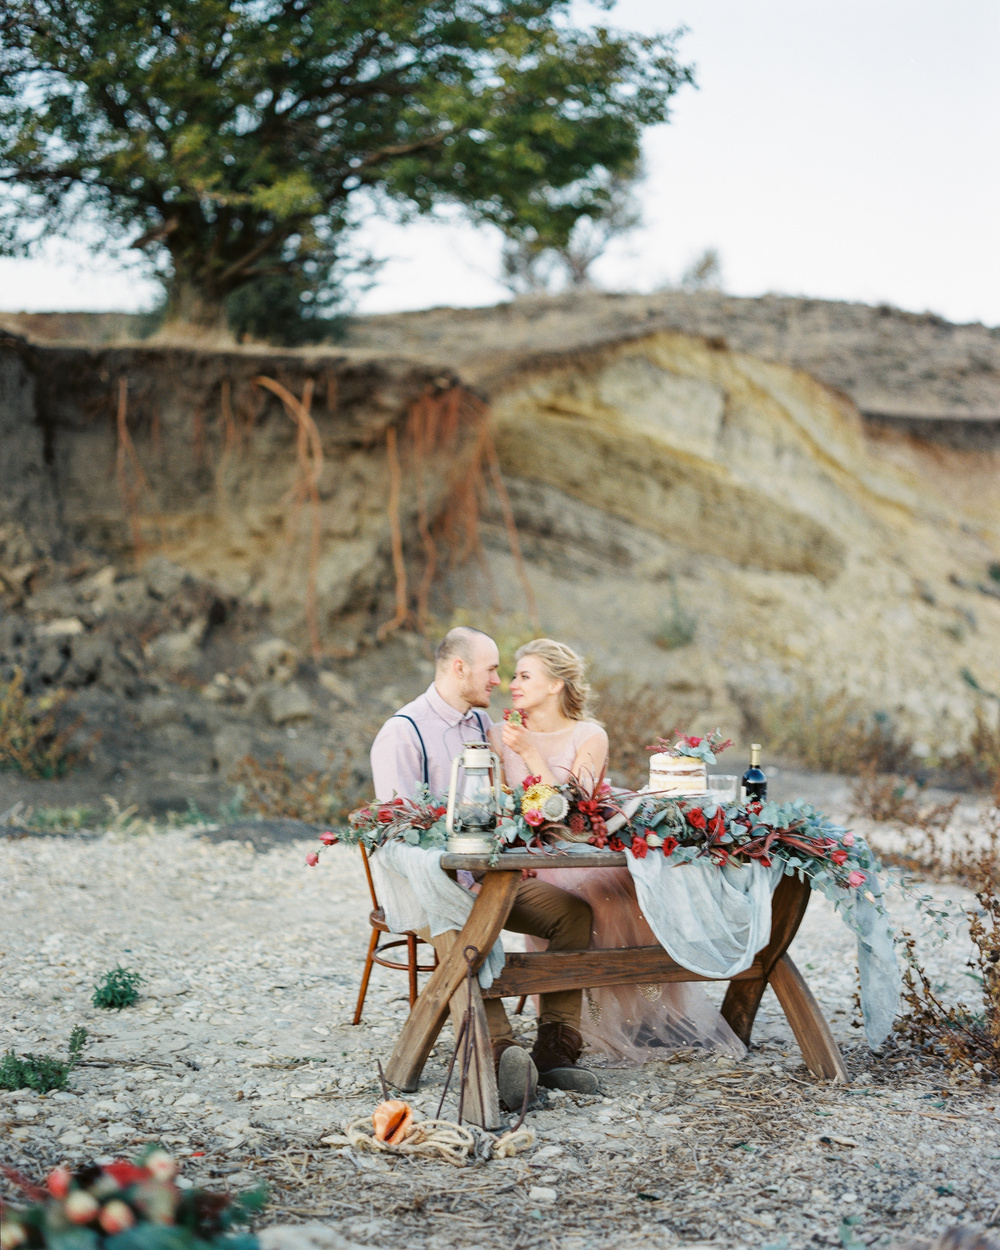 Beautiful wedding table set up